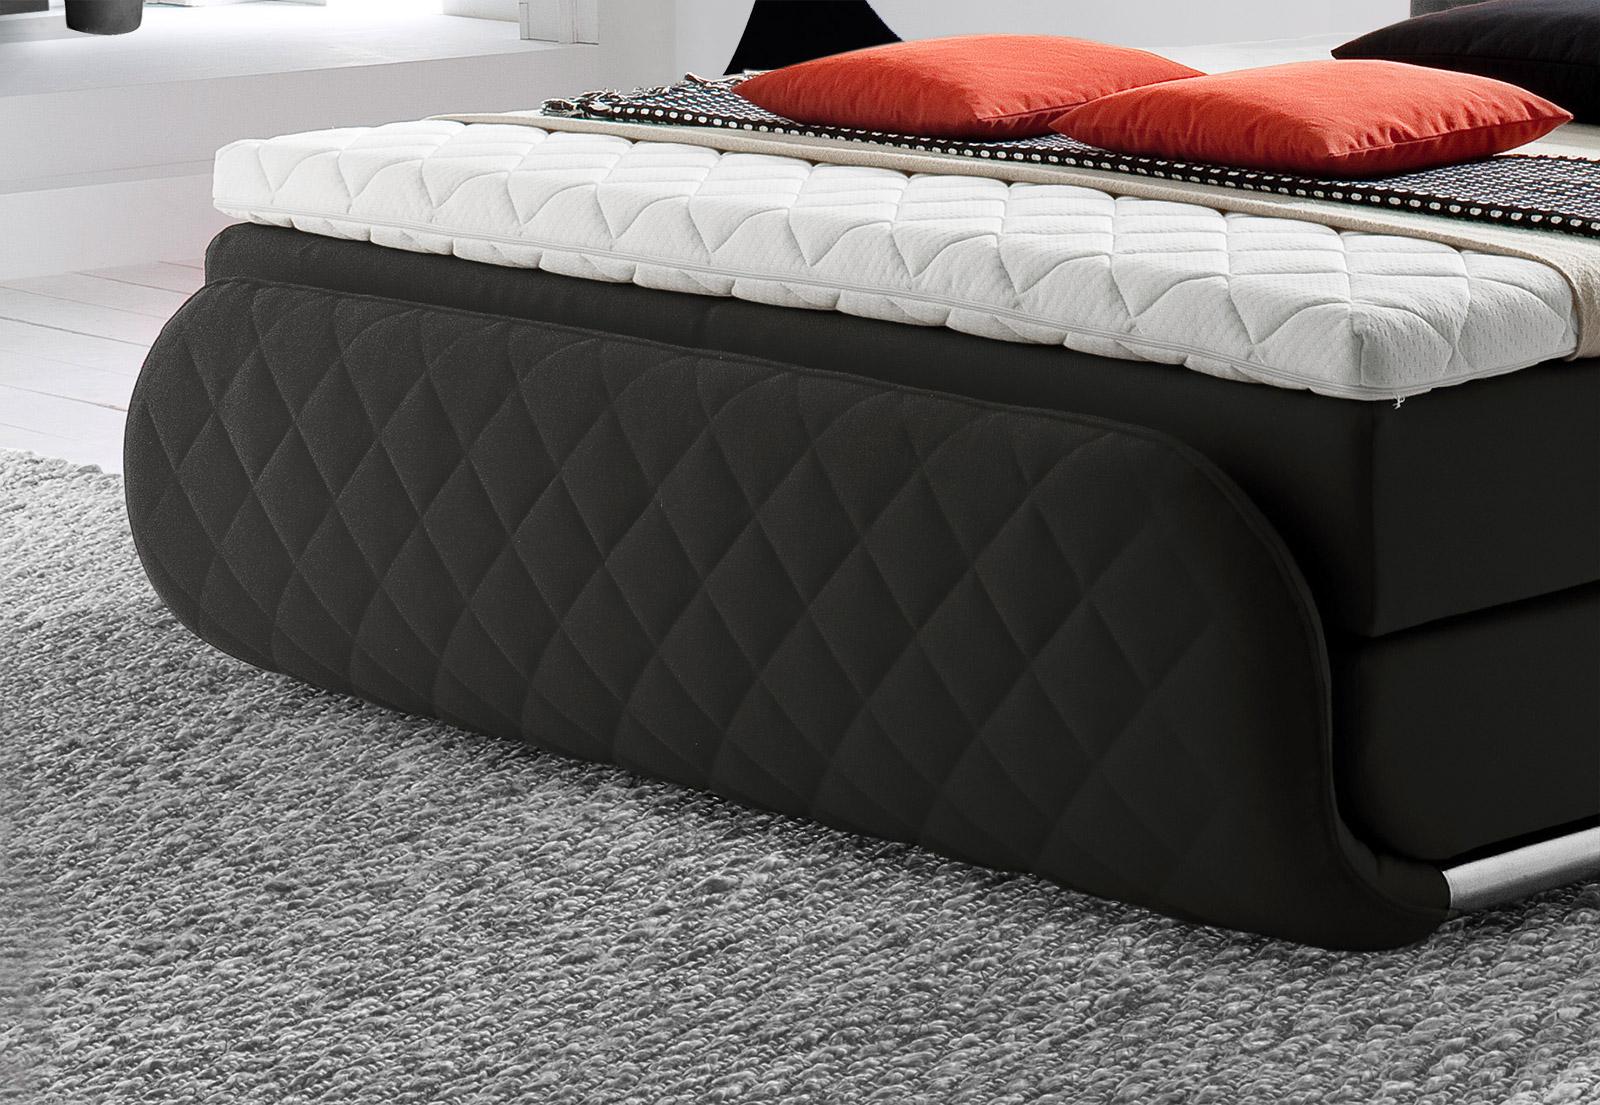 design boxspringbett mit karosteppung cincinnati. Black Bedroom Furniture Sets. Home Design Ideas